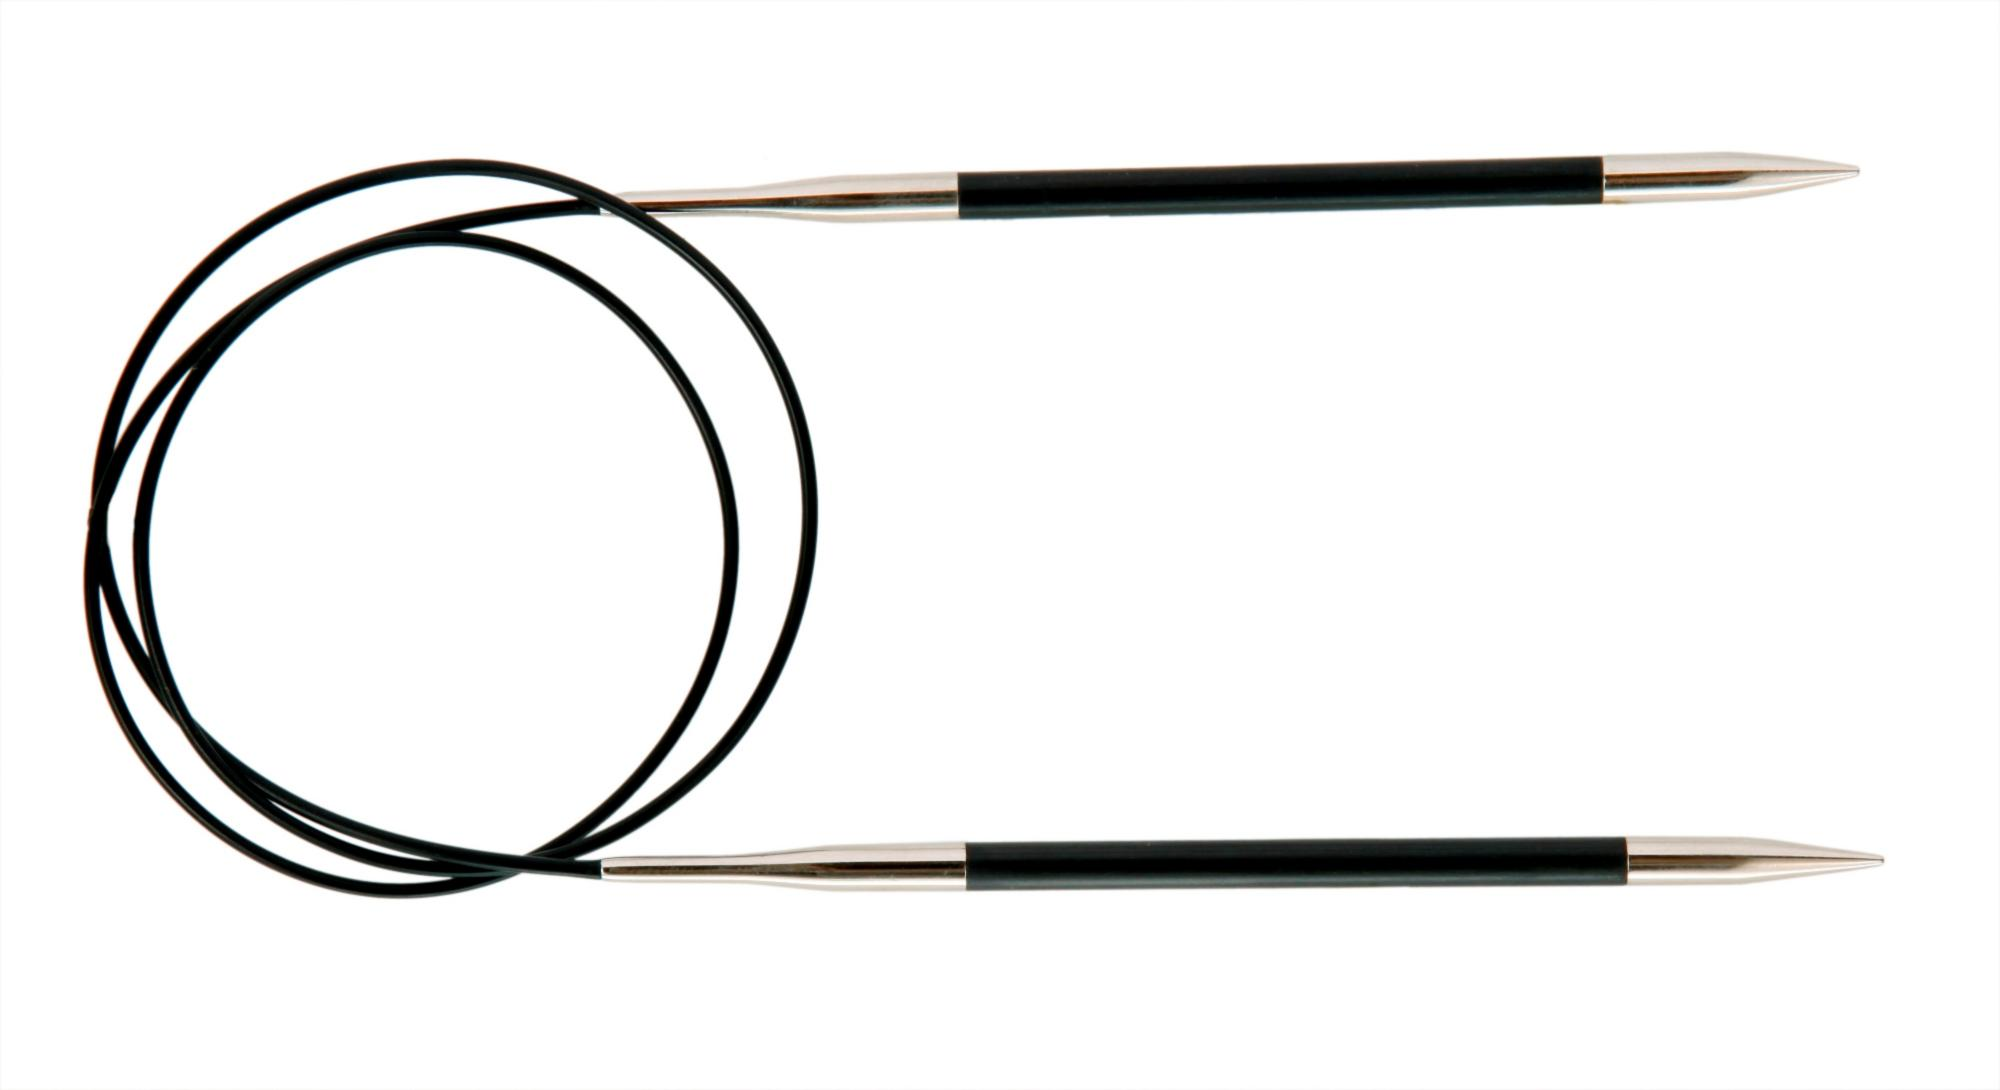 Спицы круговые 40 см Karbonz KnitPro, 41151, 5.50 мм